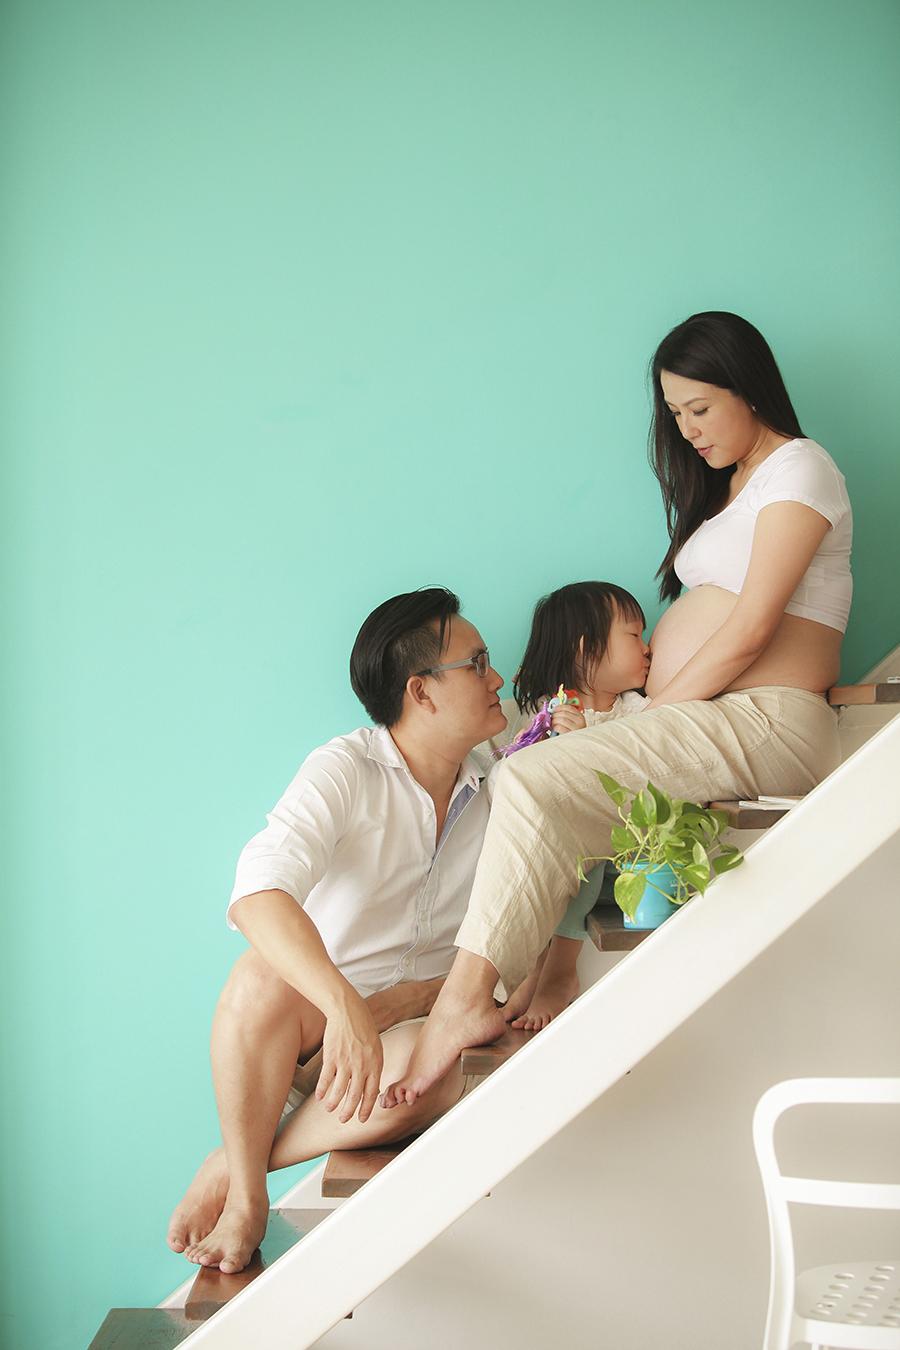 maternity + family portrait photography by kurt ahs . 9139.jpg